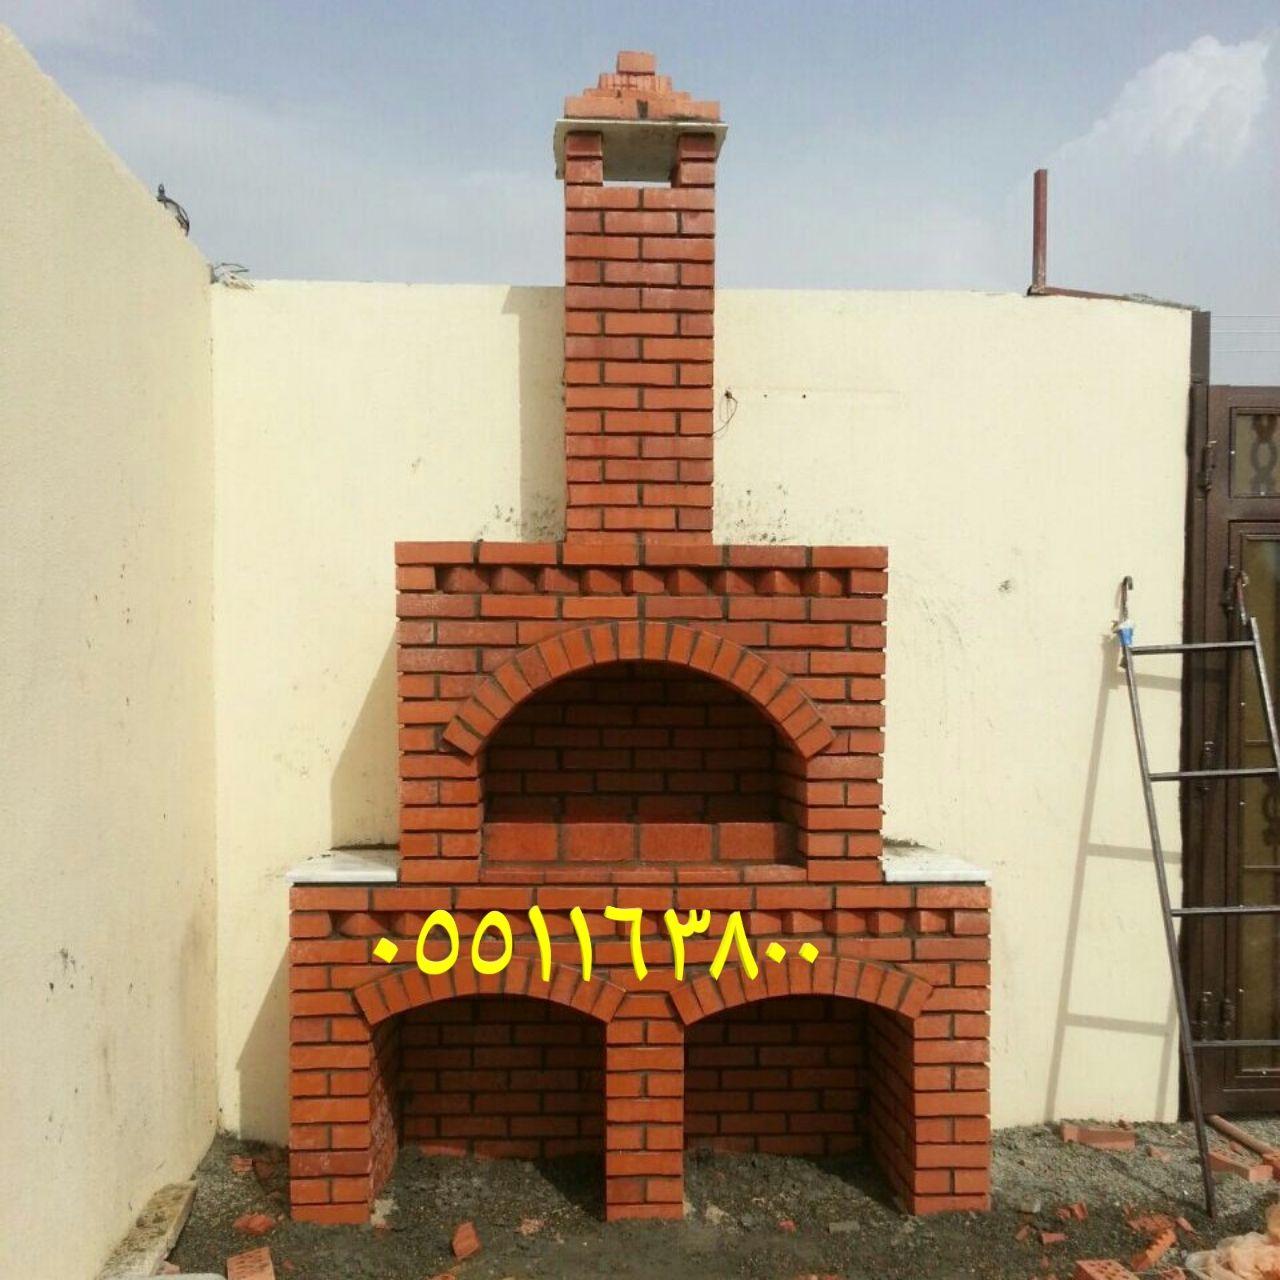 شوايات حدائق شوايات حديد شوايات حدائق السلطان شوايات حجرية Fireplace Home Decor Decor